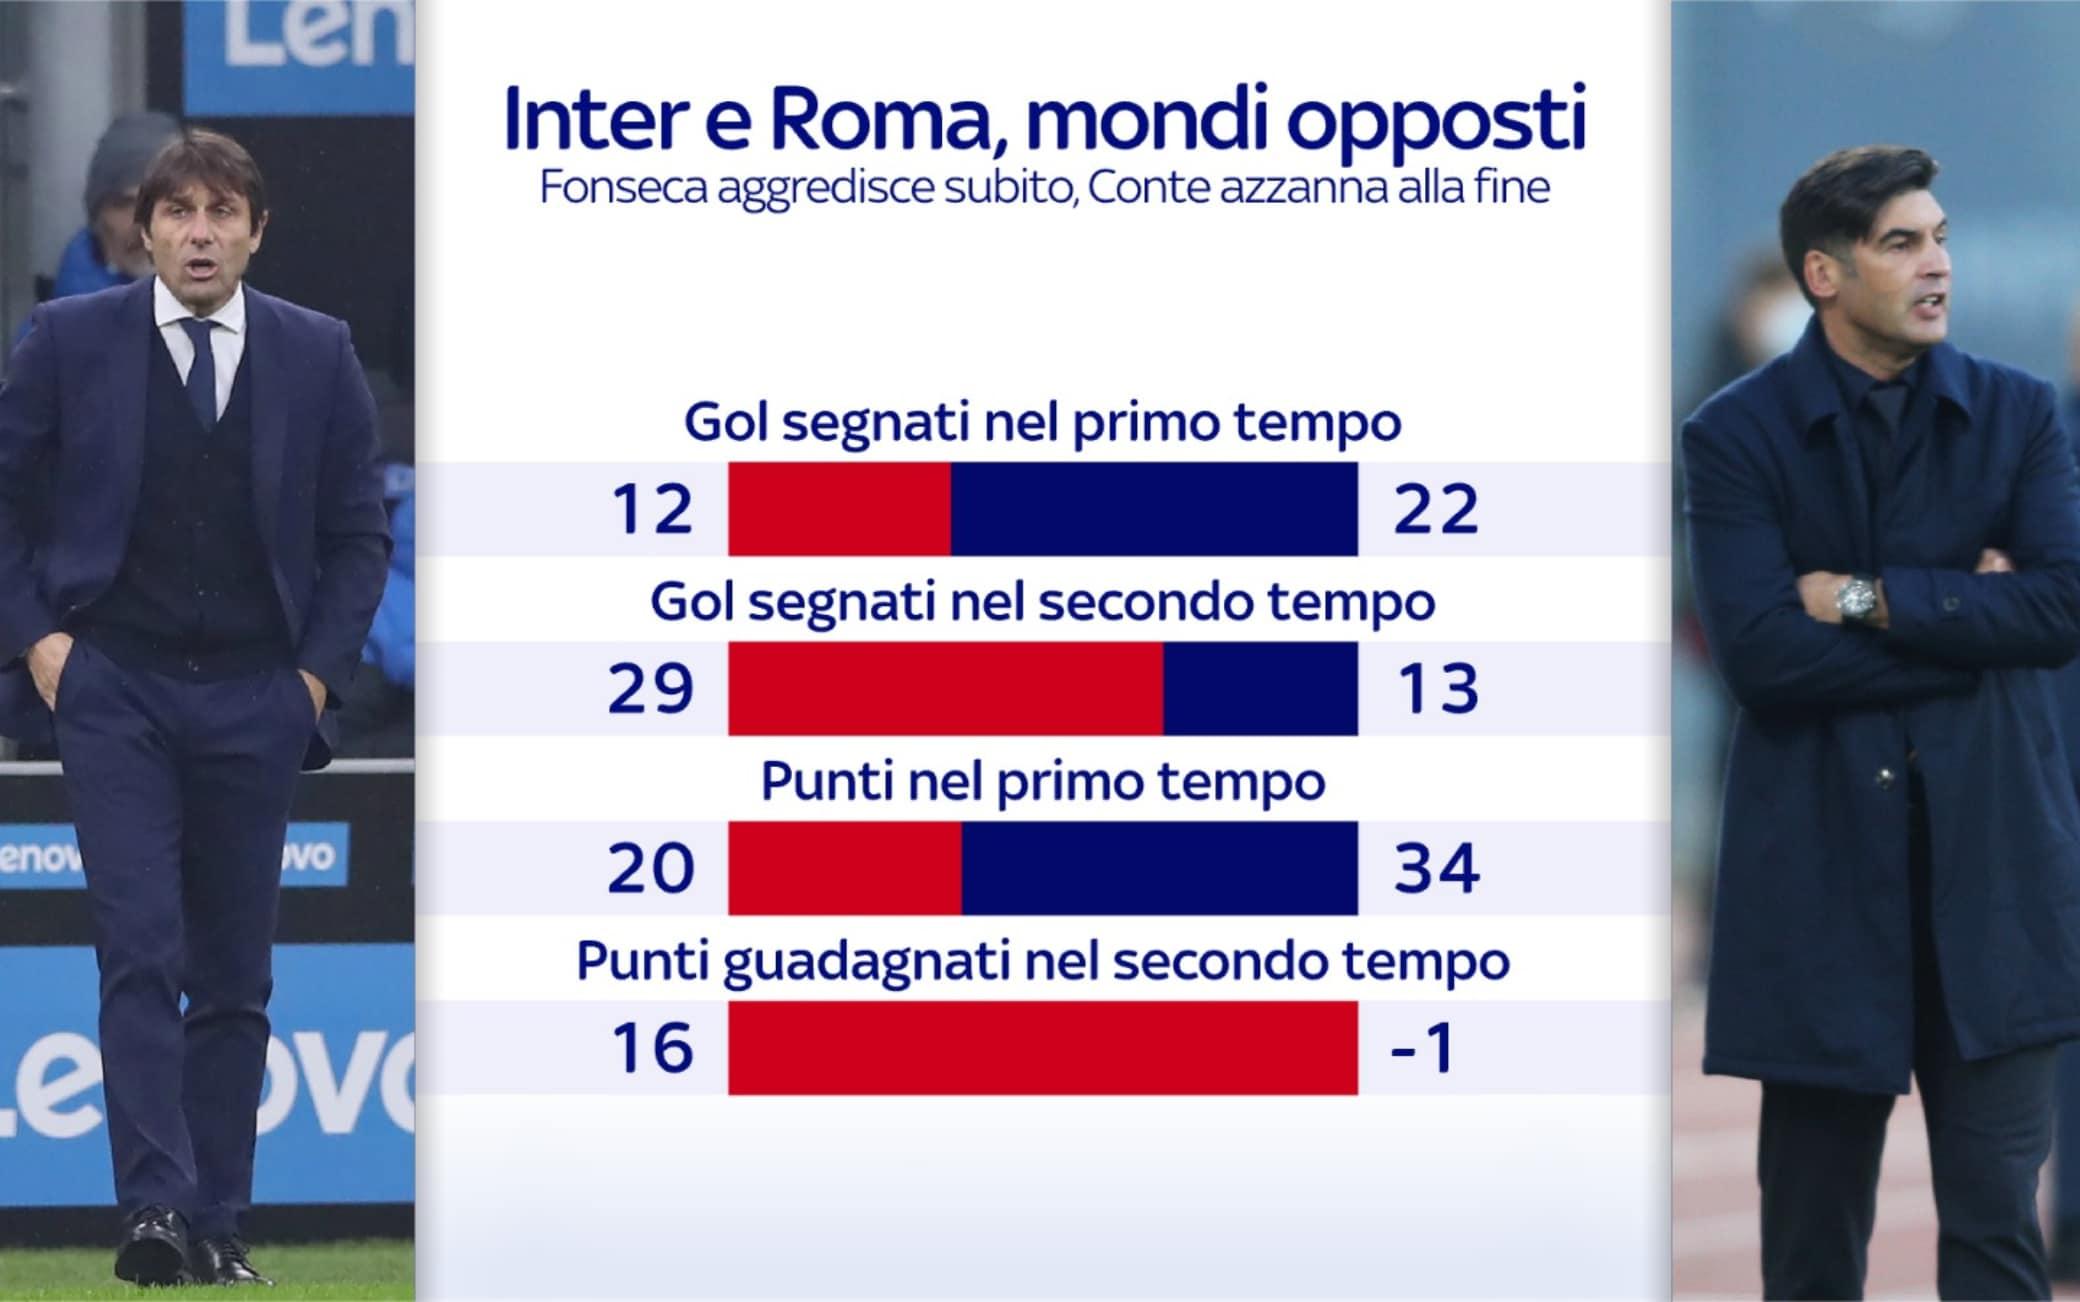 Roma Inter, due mondi opposti